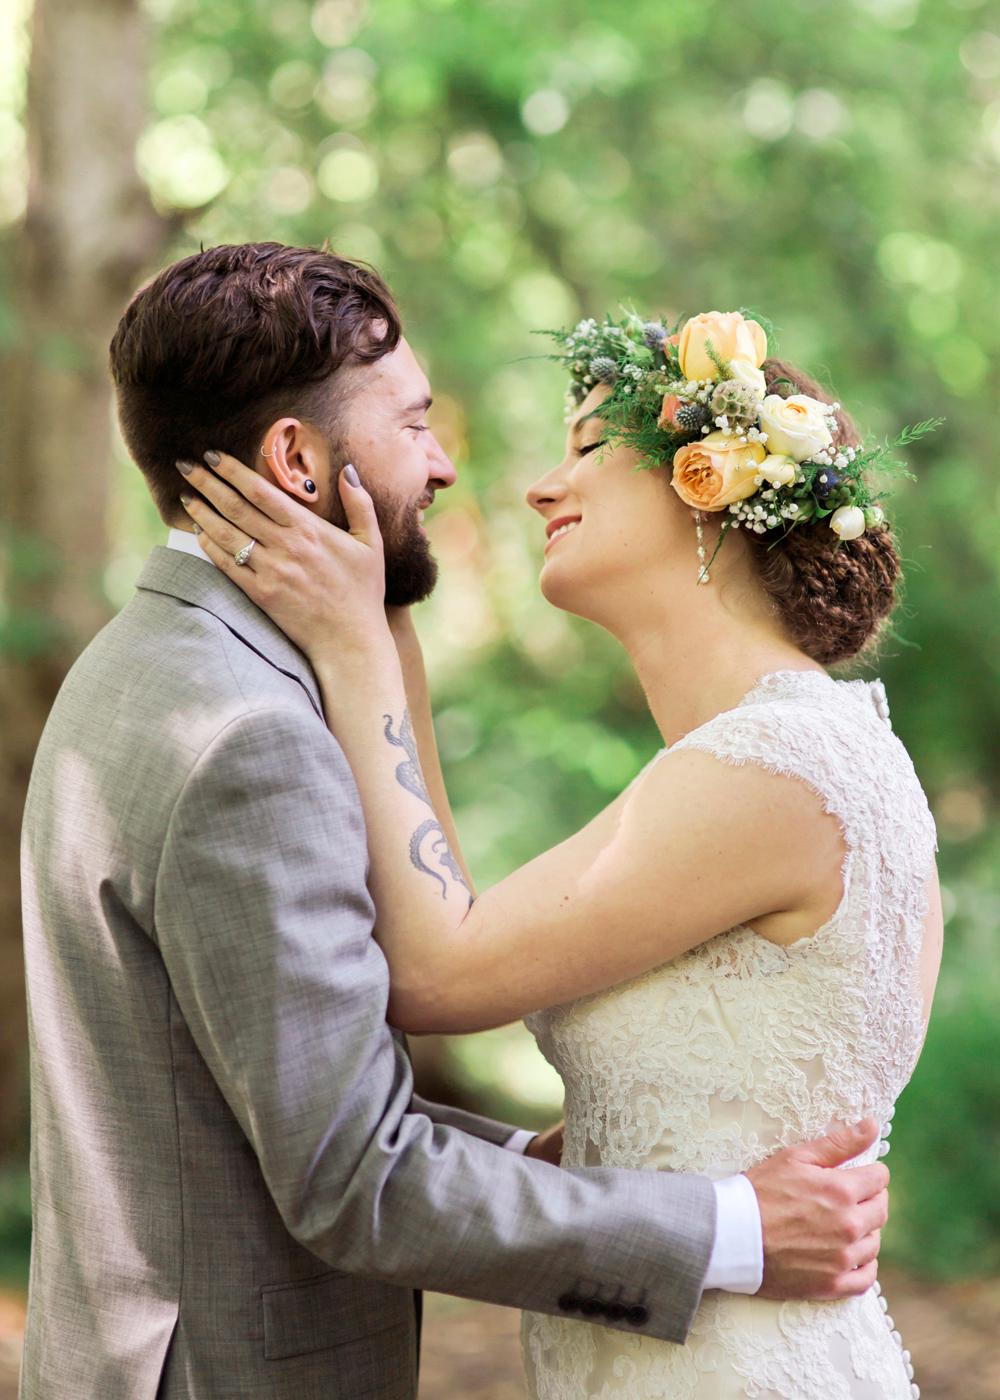 aptos-village-park-wedding-photography-lilouette-04.jpg